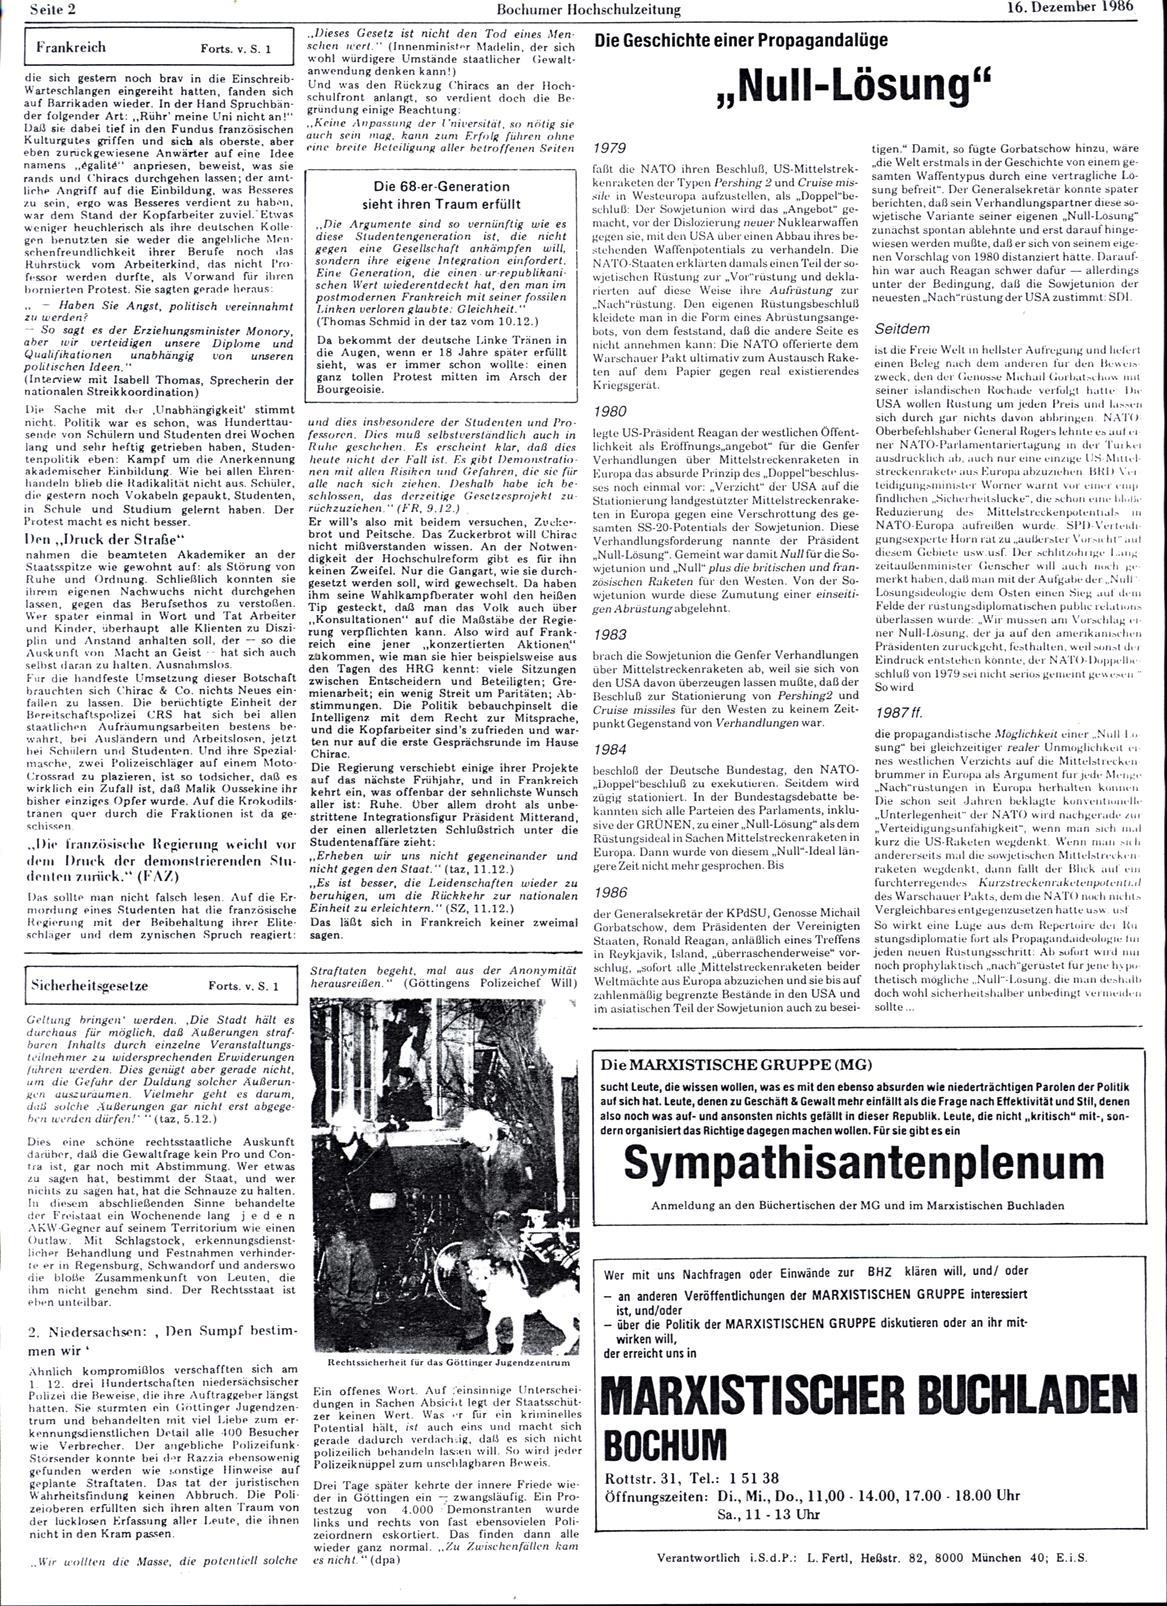 Bochum_BHZ_19861216_142_002